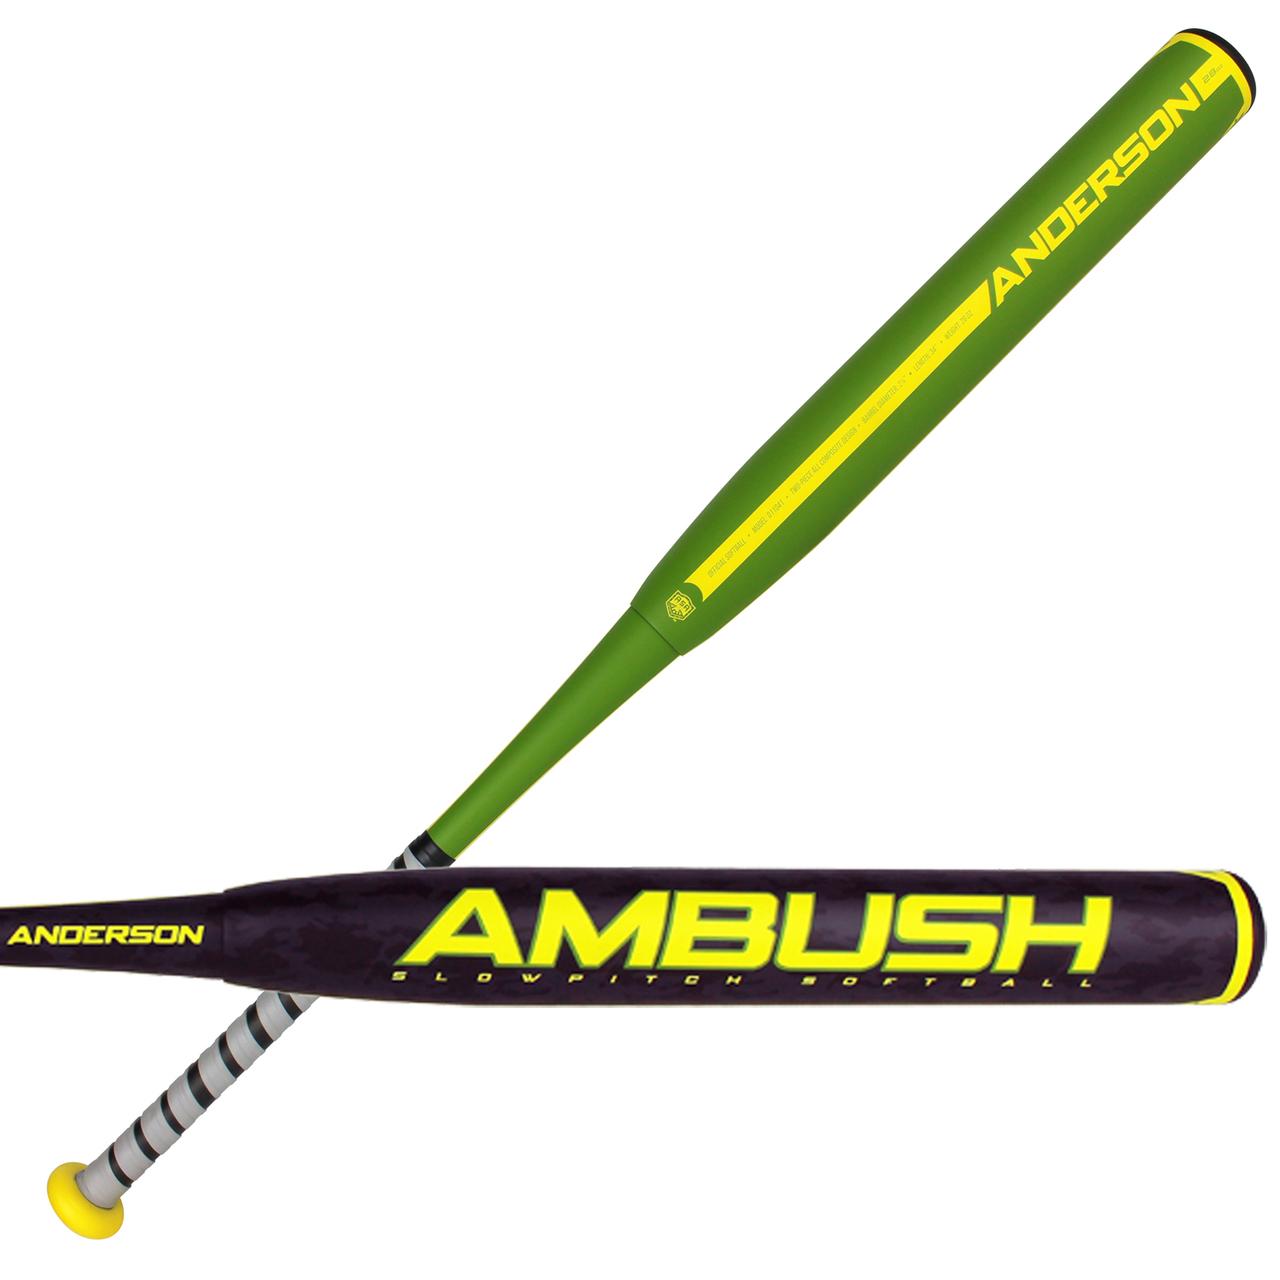 anderson-bat-company-ambush-asa-slow-pitch-softball-bat-34-inch-26-oz 110413426  874147007723 The 2017 <strong>Ambush Slow Pitch</strong> two piece composite bat is made